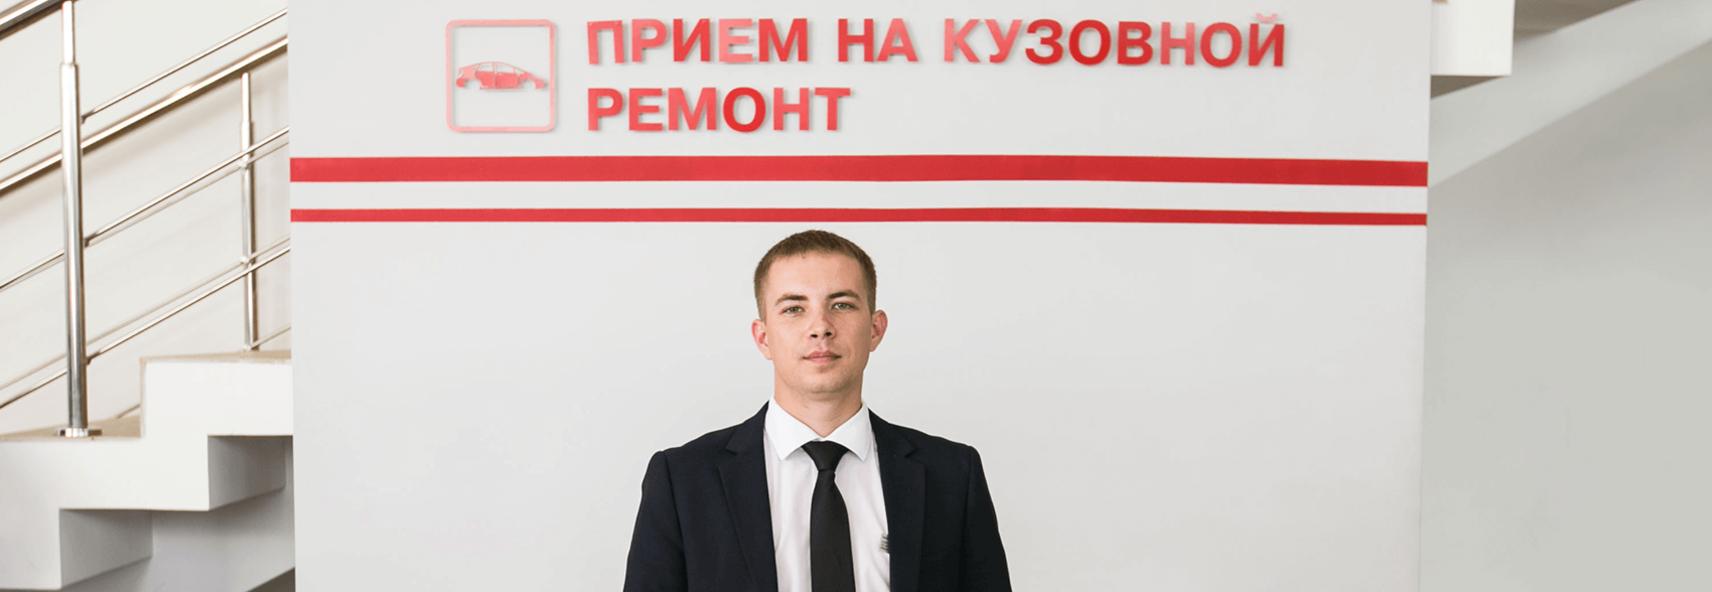 АСПЭК-Моторс-Сервис (Кузовной)